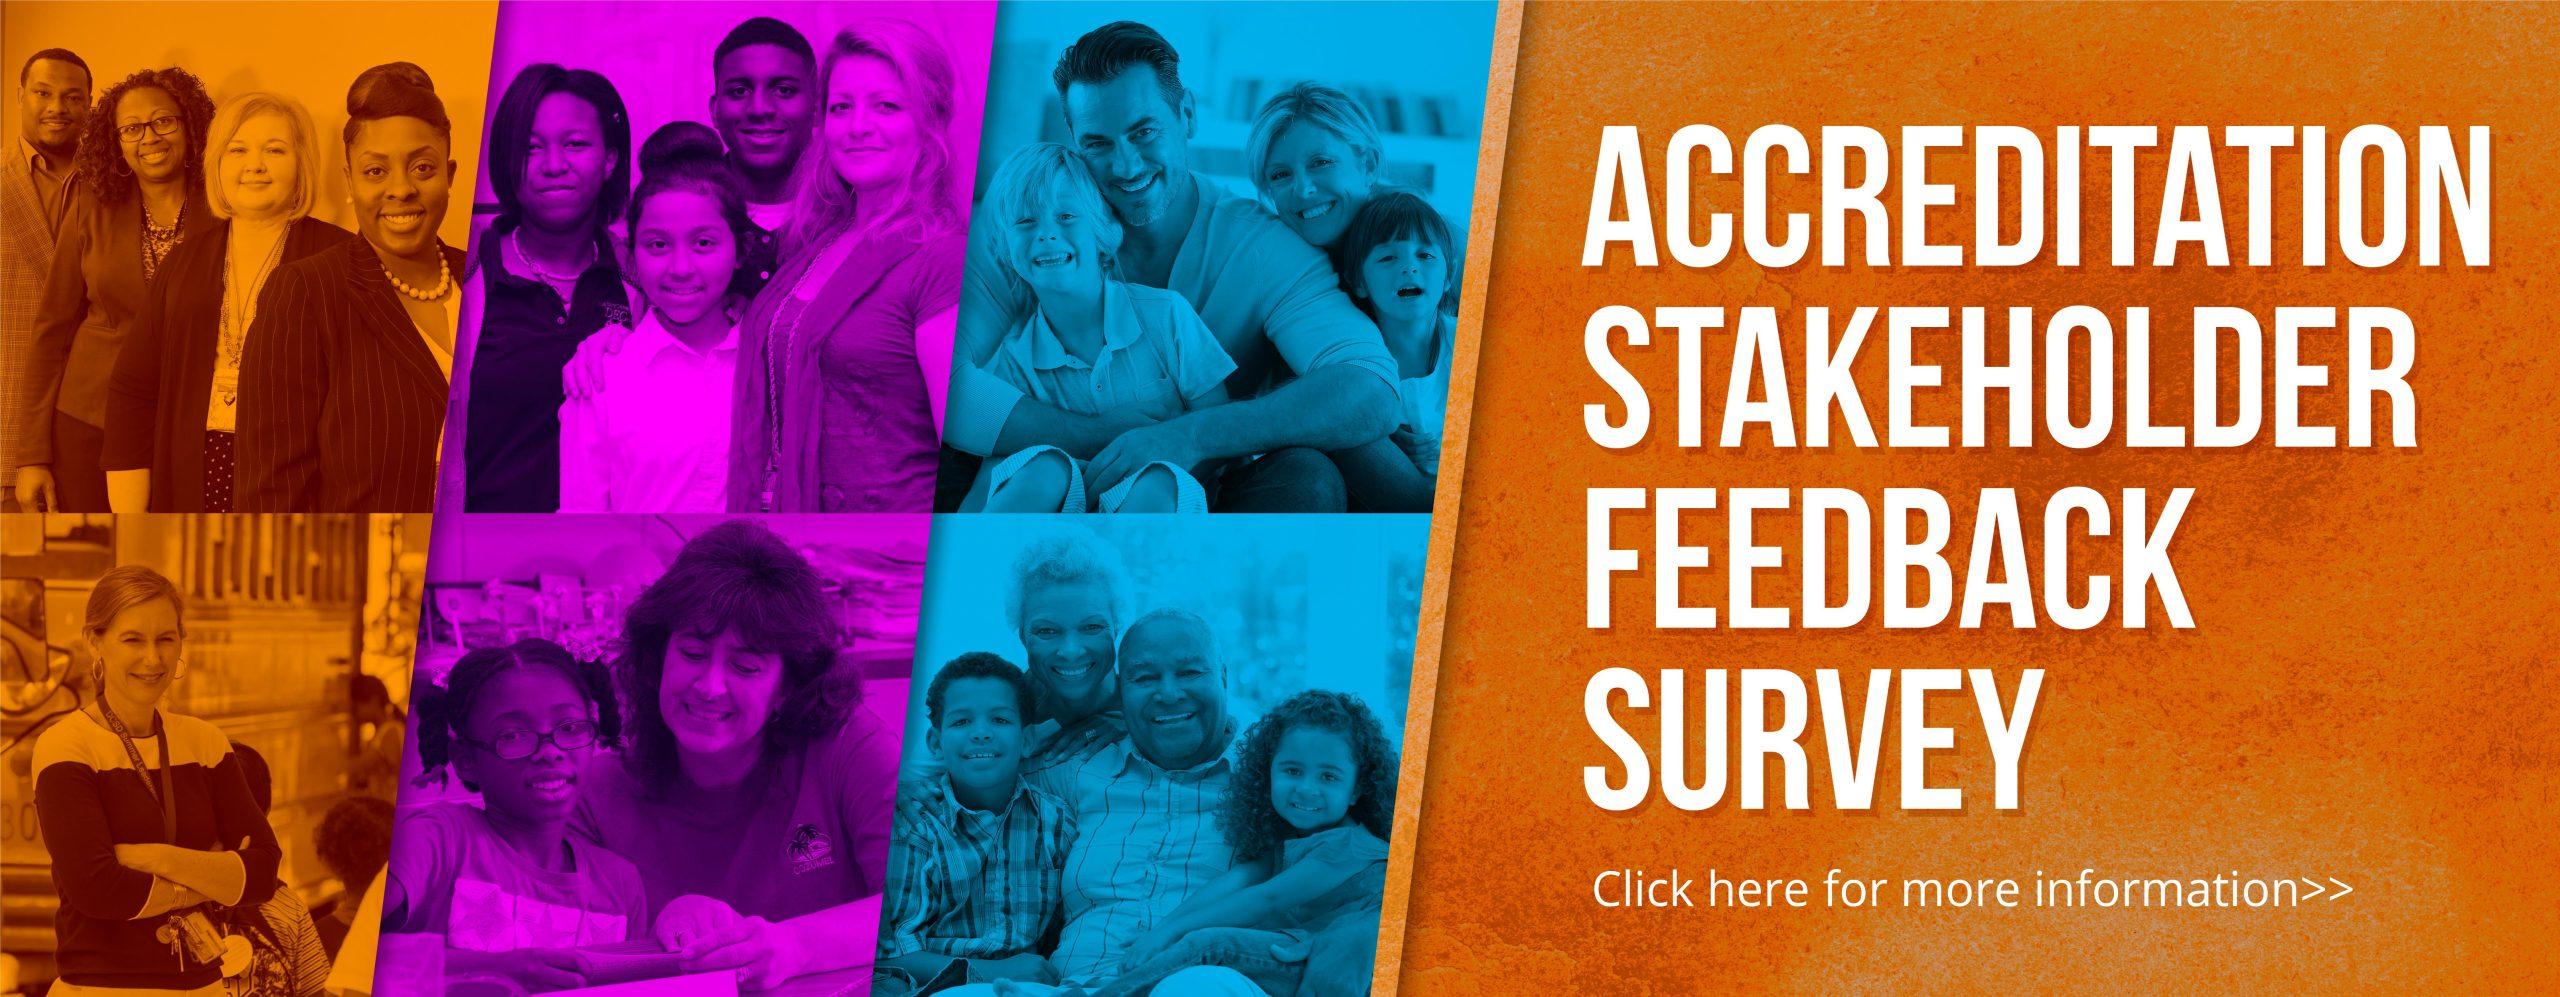 Stakeholder Feedback Survey Web Banner